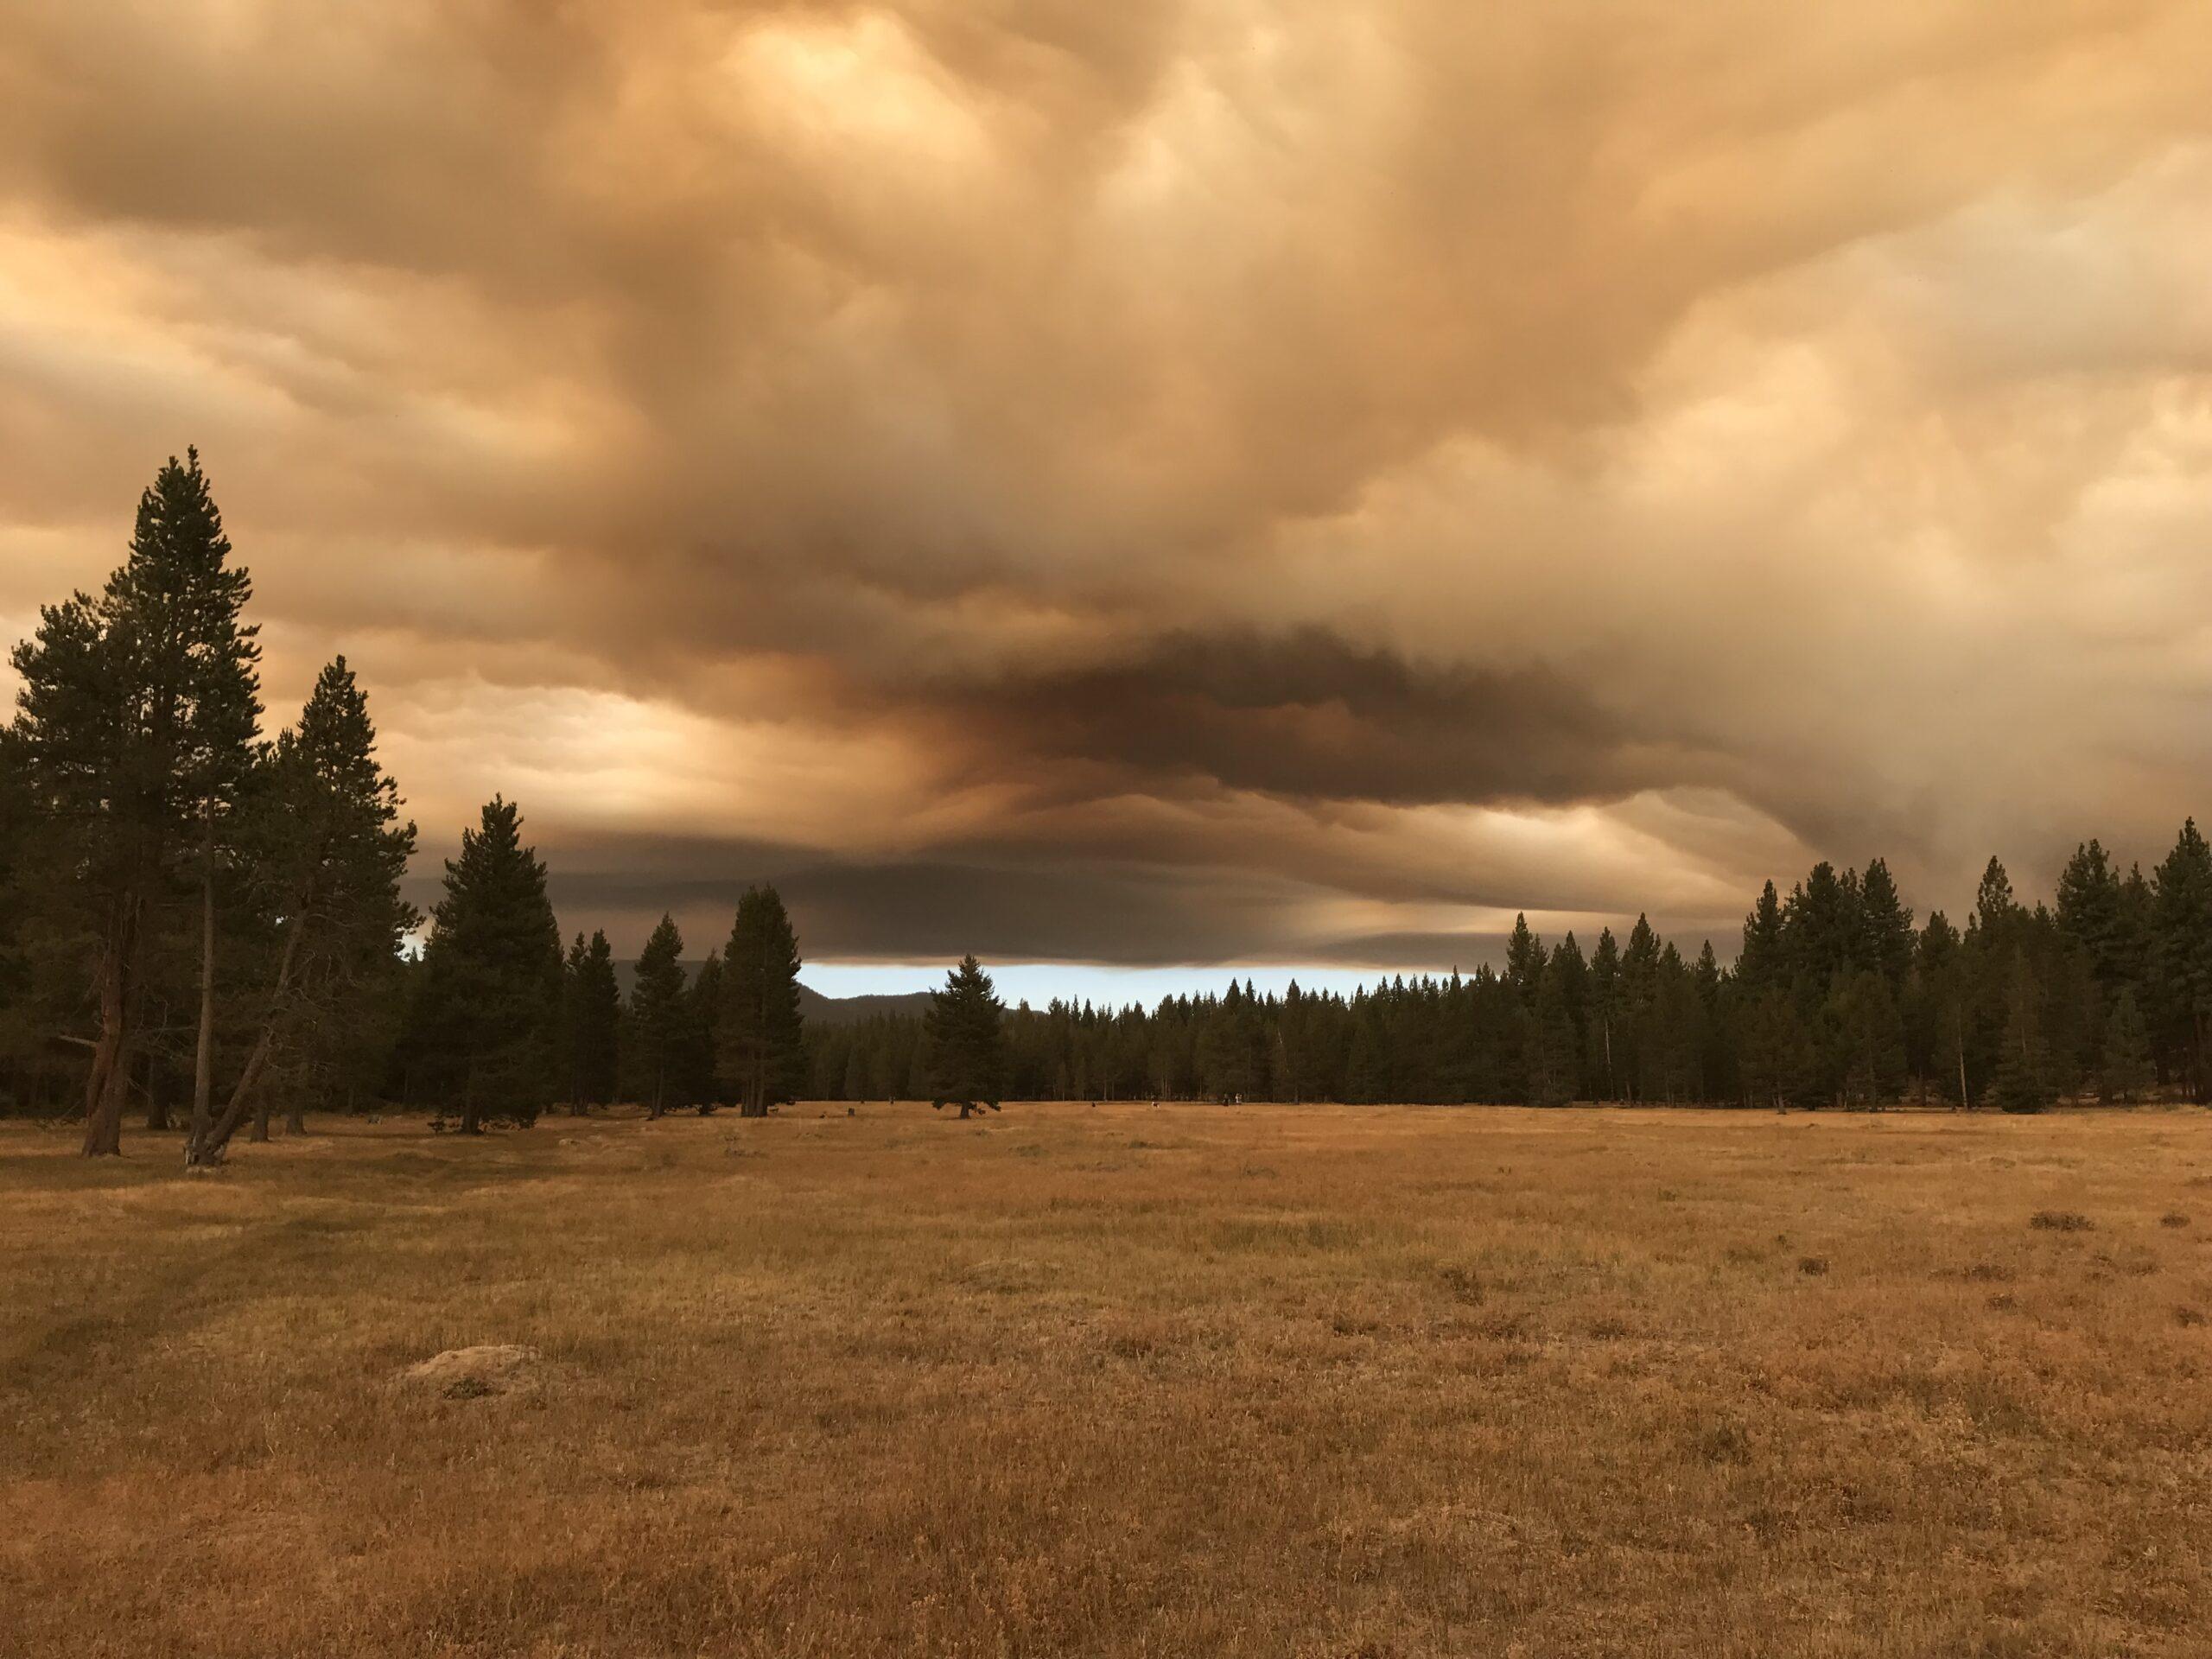 A meadow near Patricia Sussman's home in the Bijou neighborhood of South Lake Tahoe, Aug. 17, 2021.